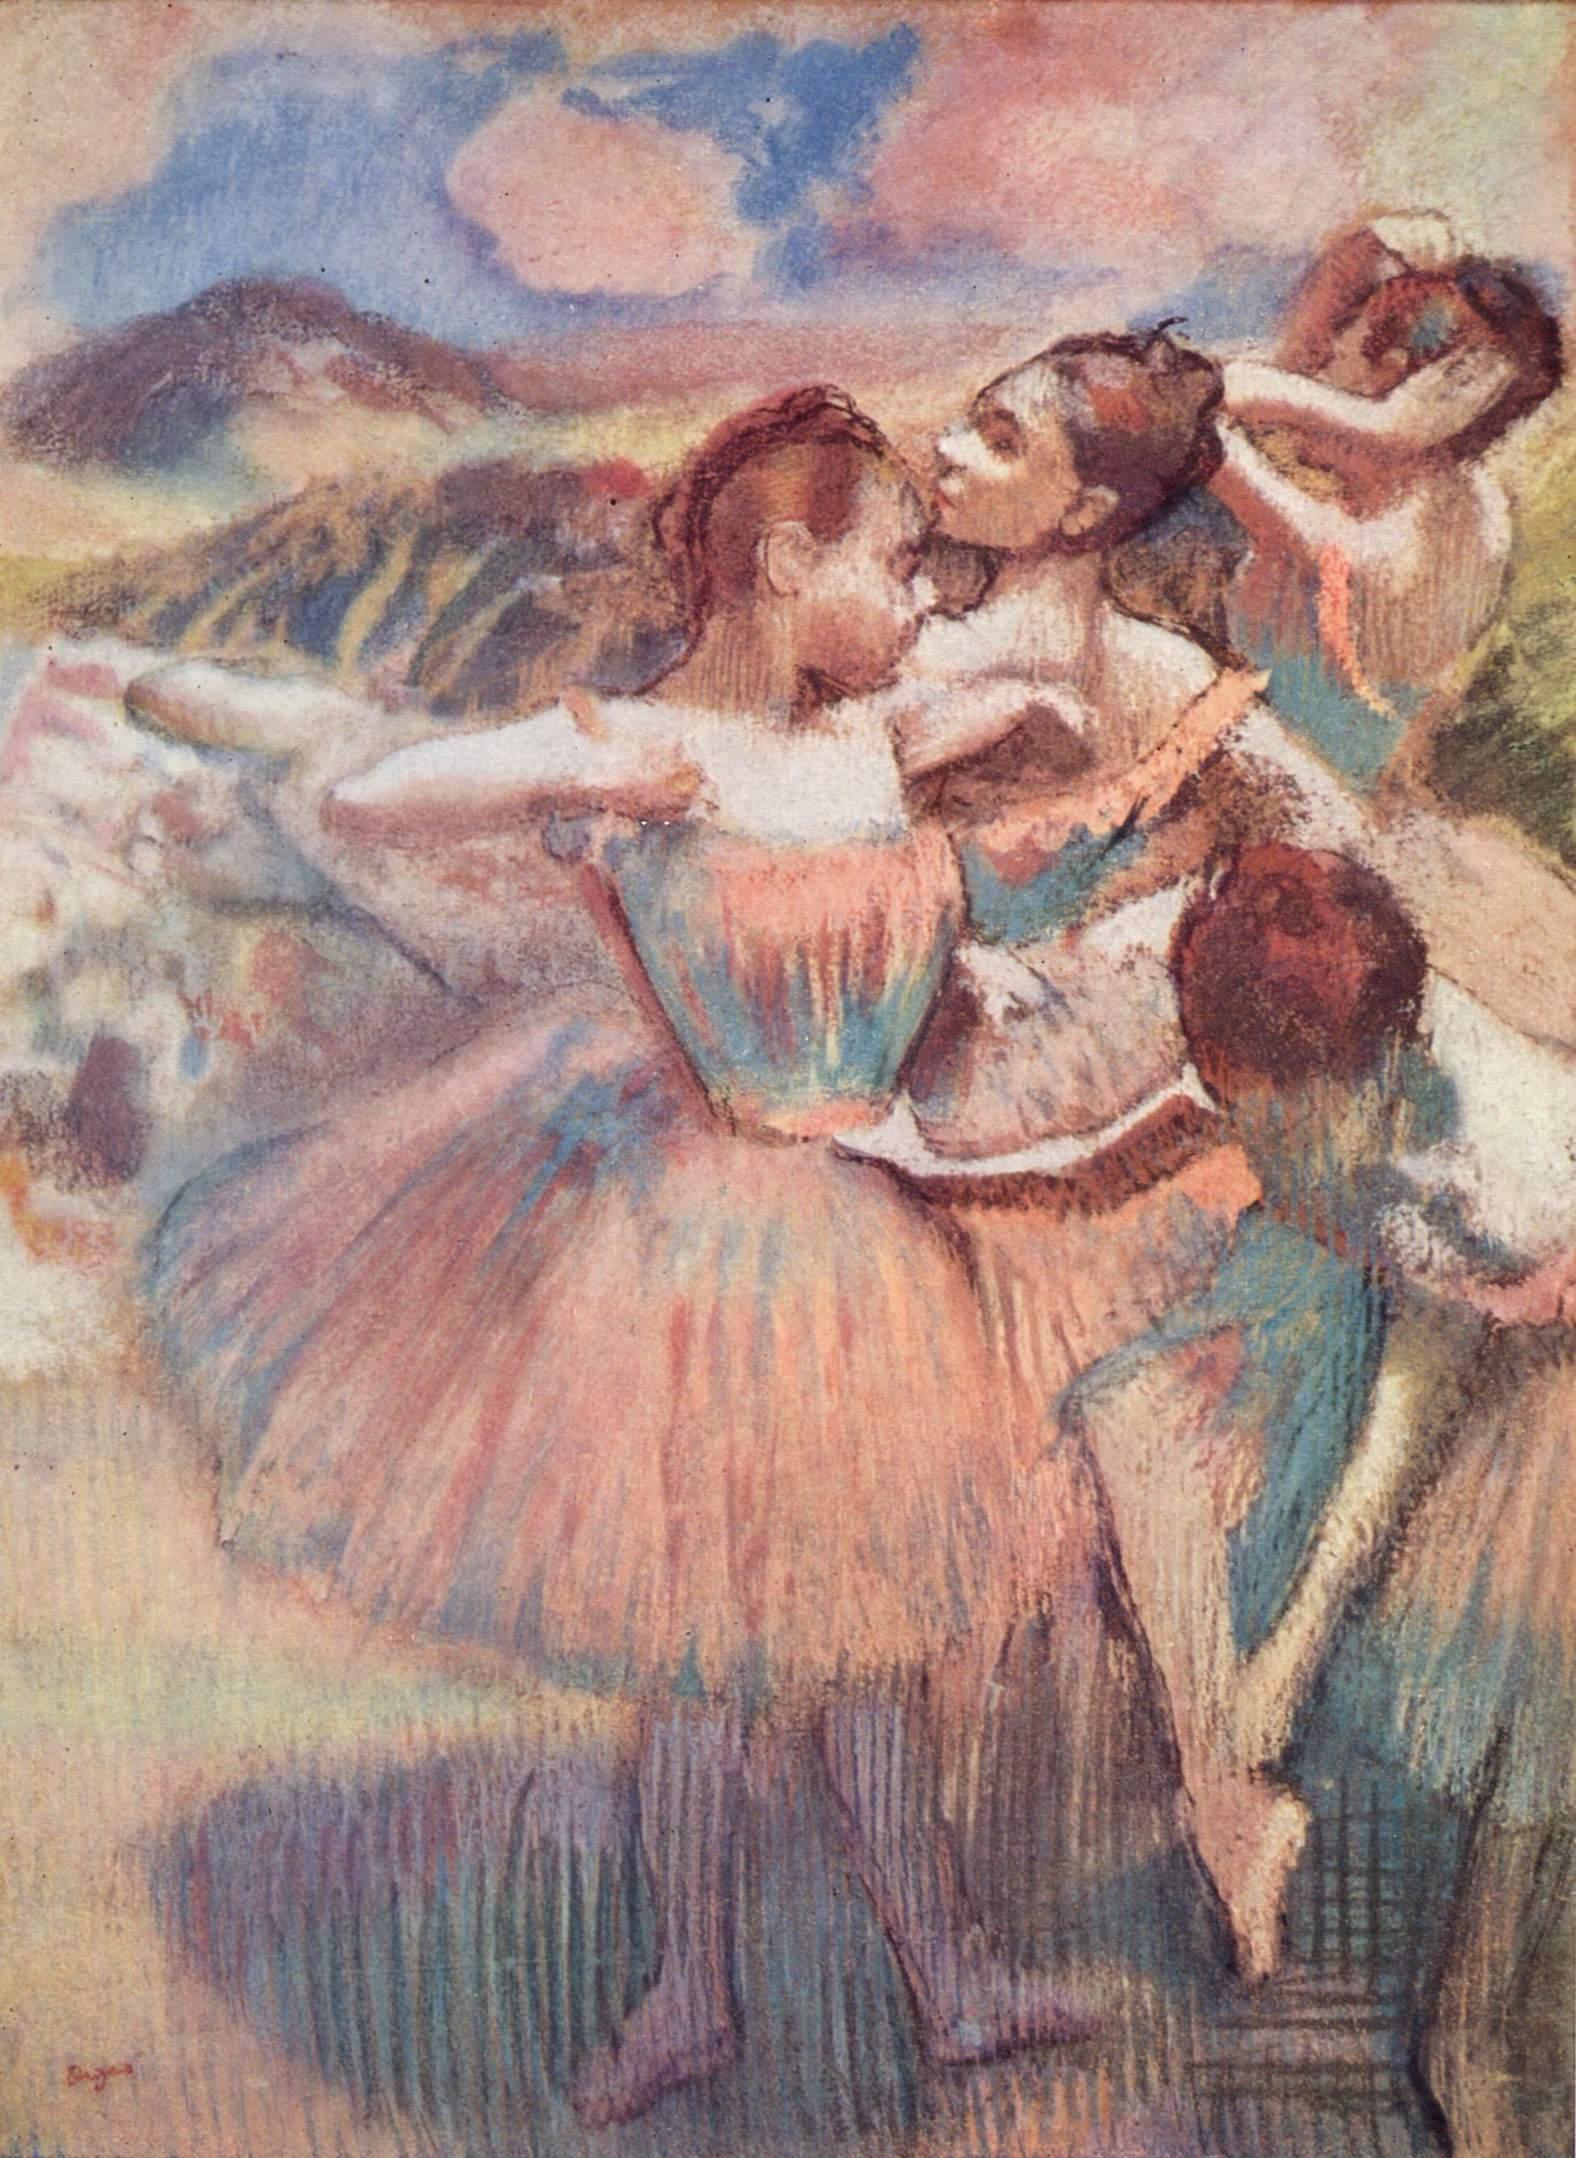 Пейзаж с танцовщицами, Эдгар-Жермен - Илер Дега